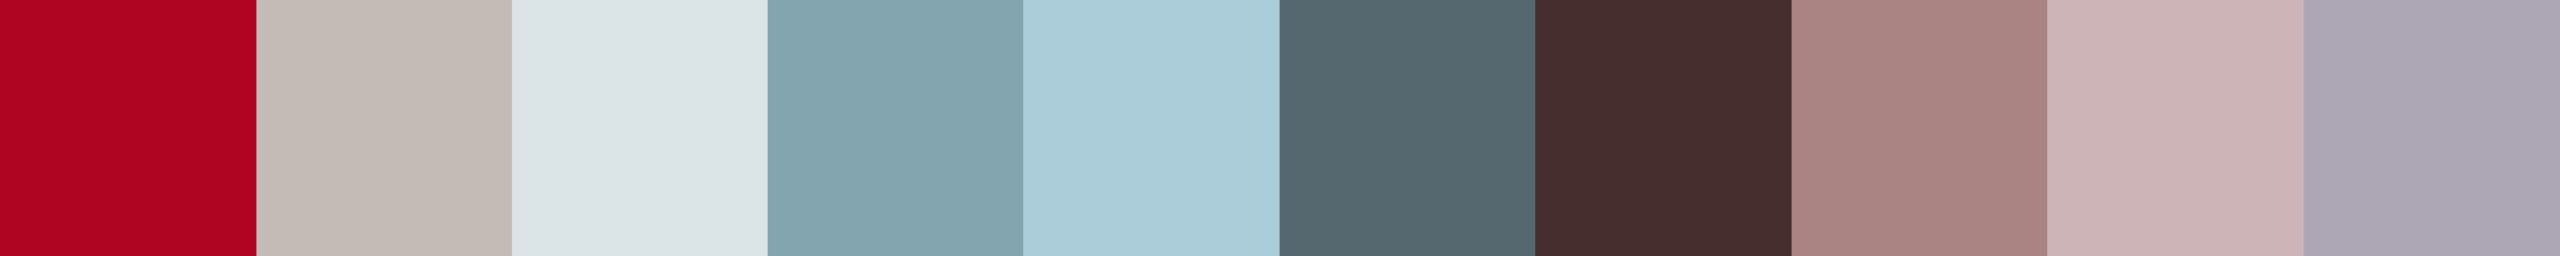 686 Efredia Color Palette